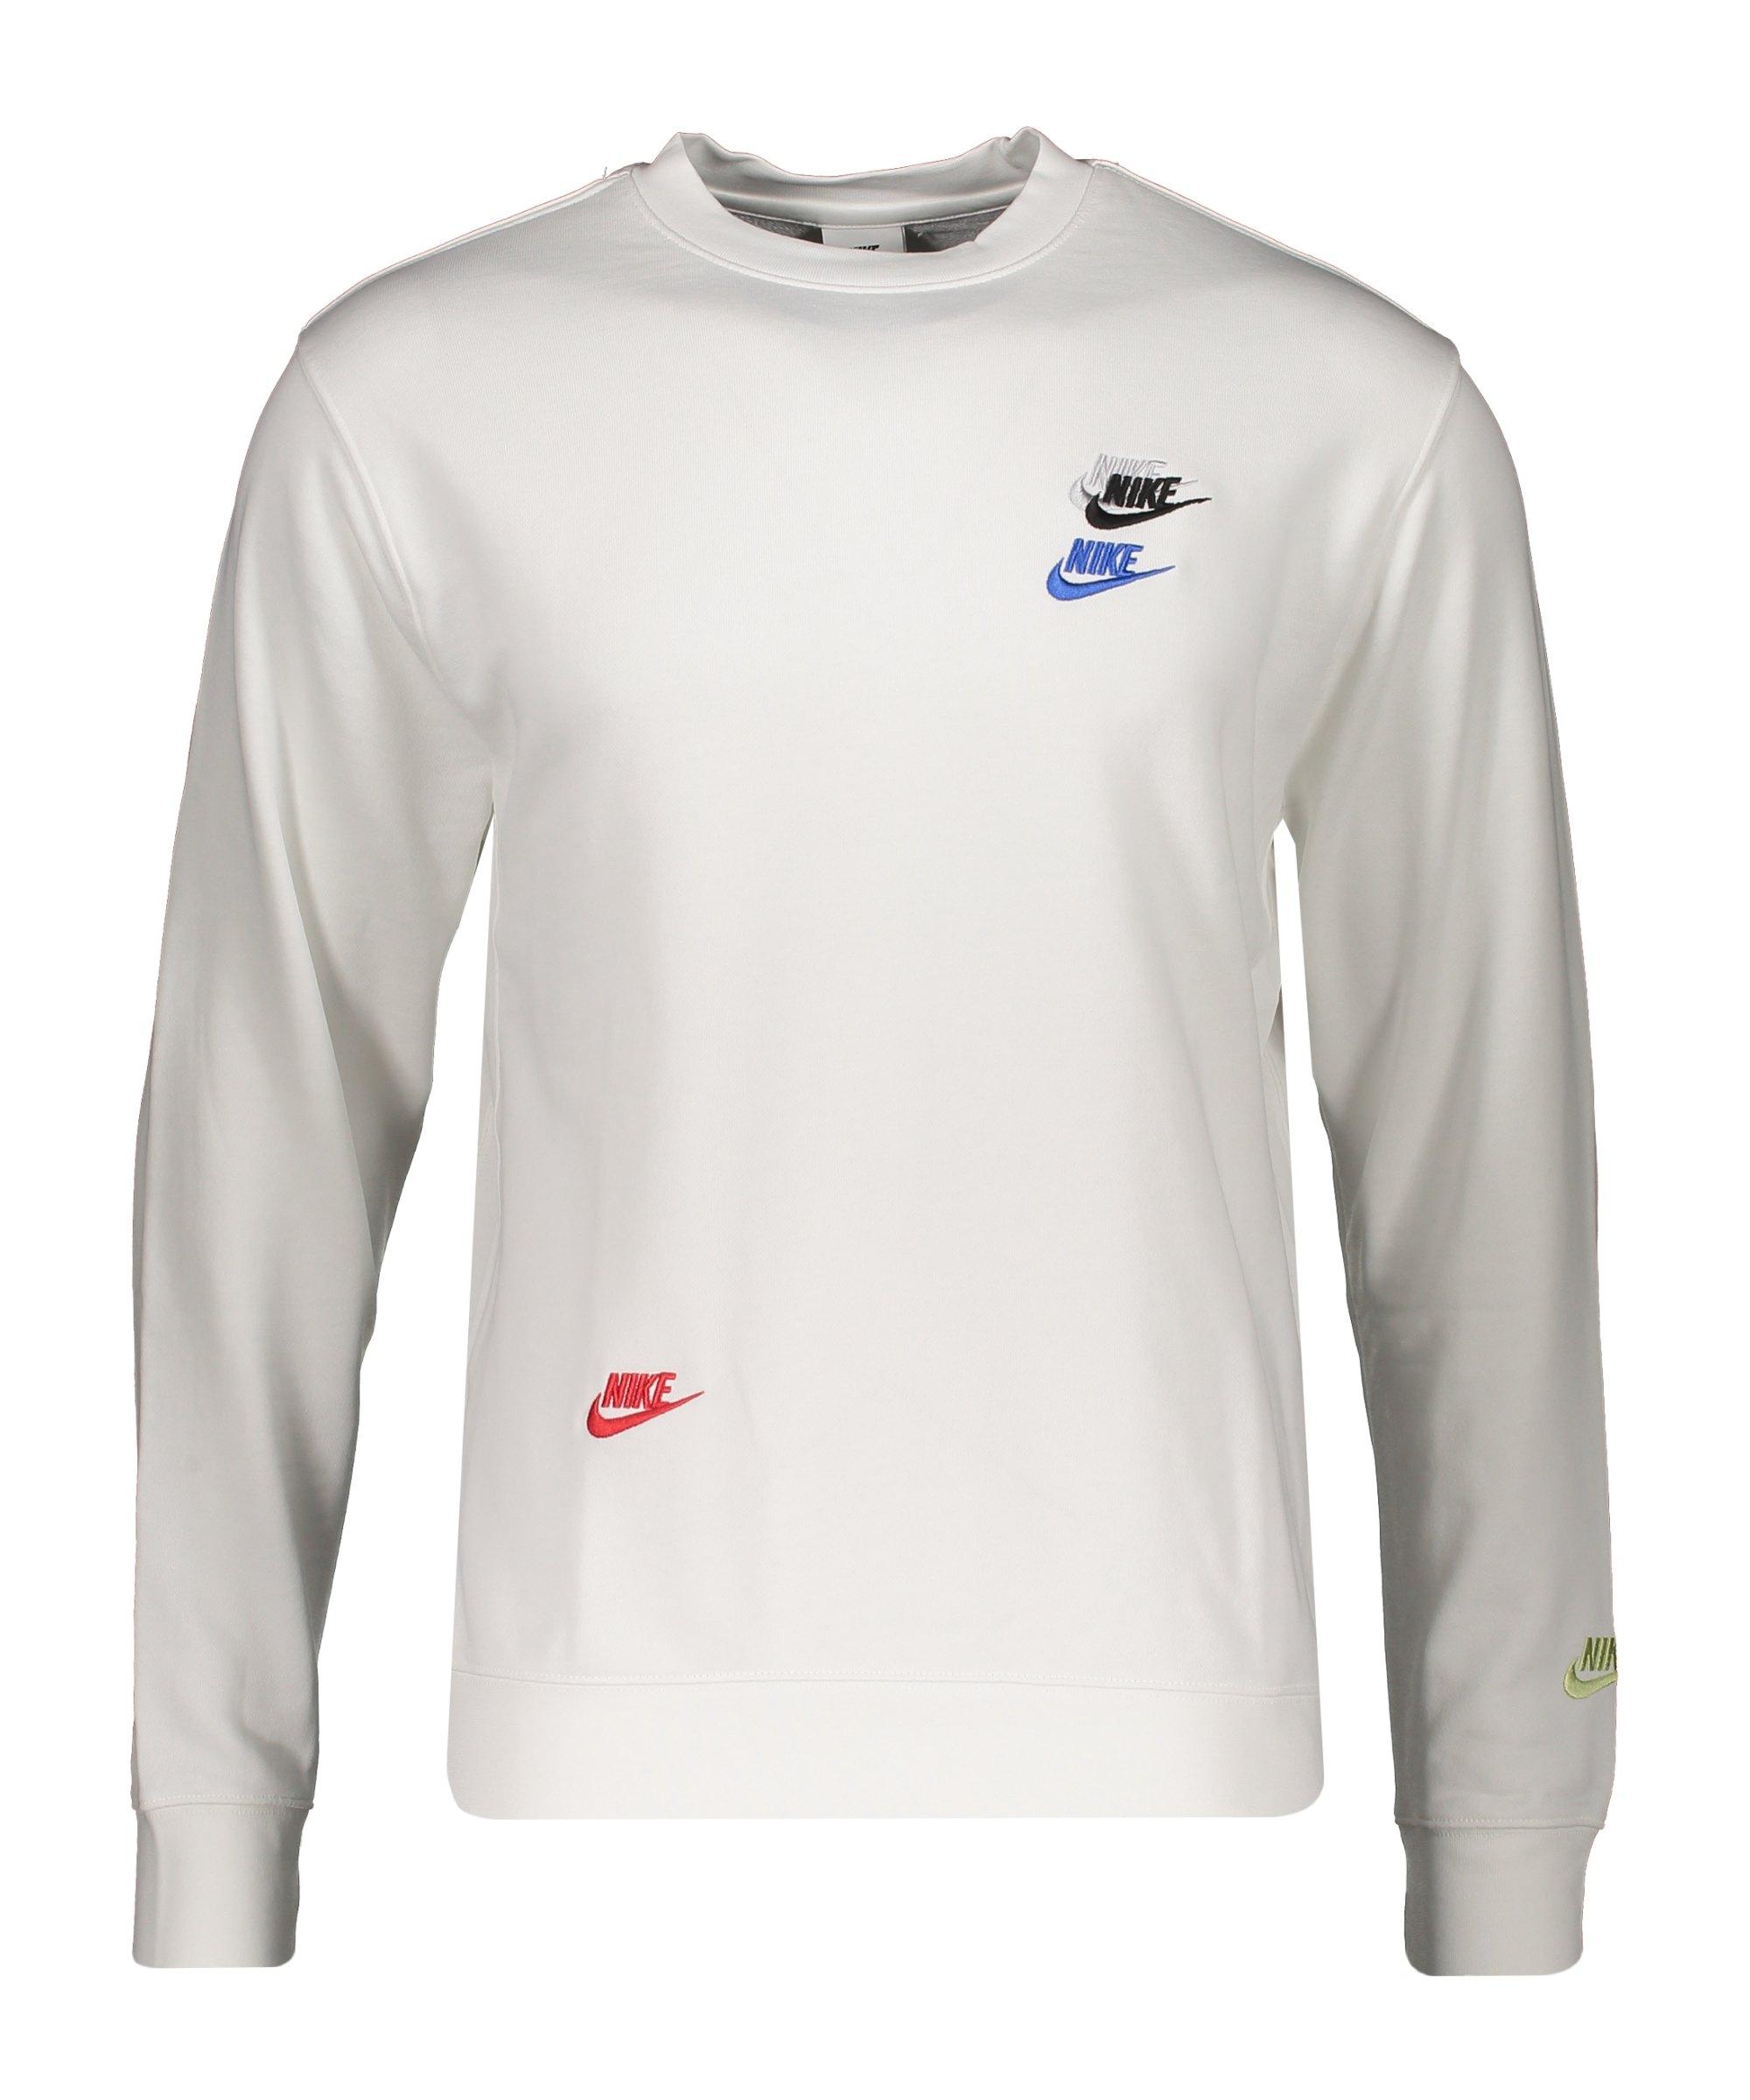 Nike Essential French Terry Crew Sweatshirt F100 - weiss